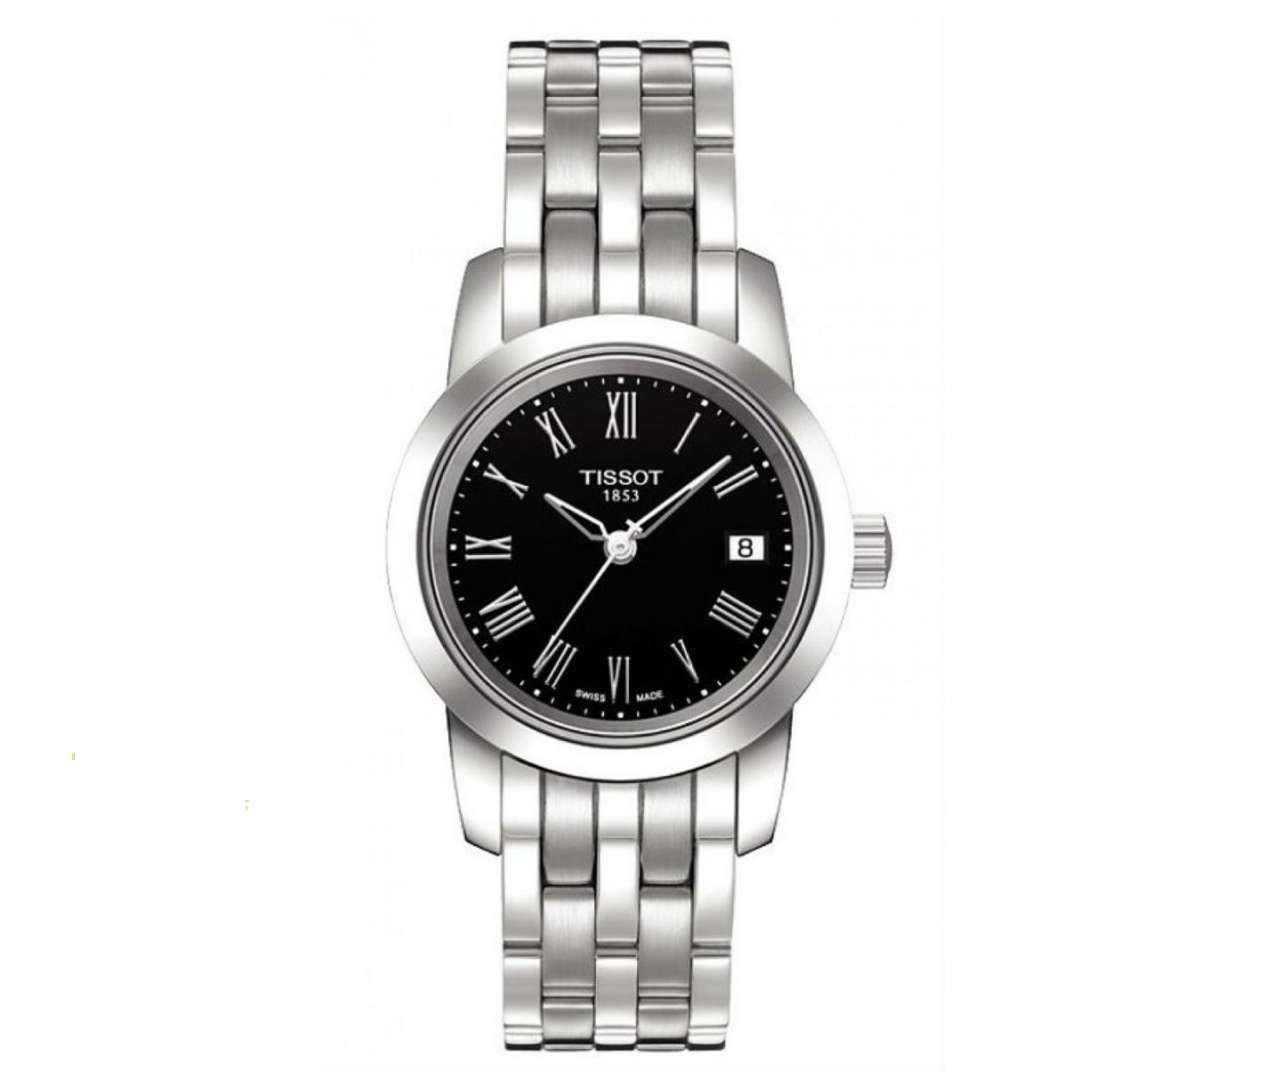 שעון יד אנלוגי tissot t033.210.11.053.00 טיסו